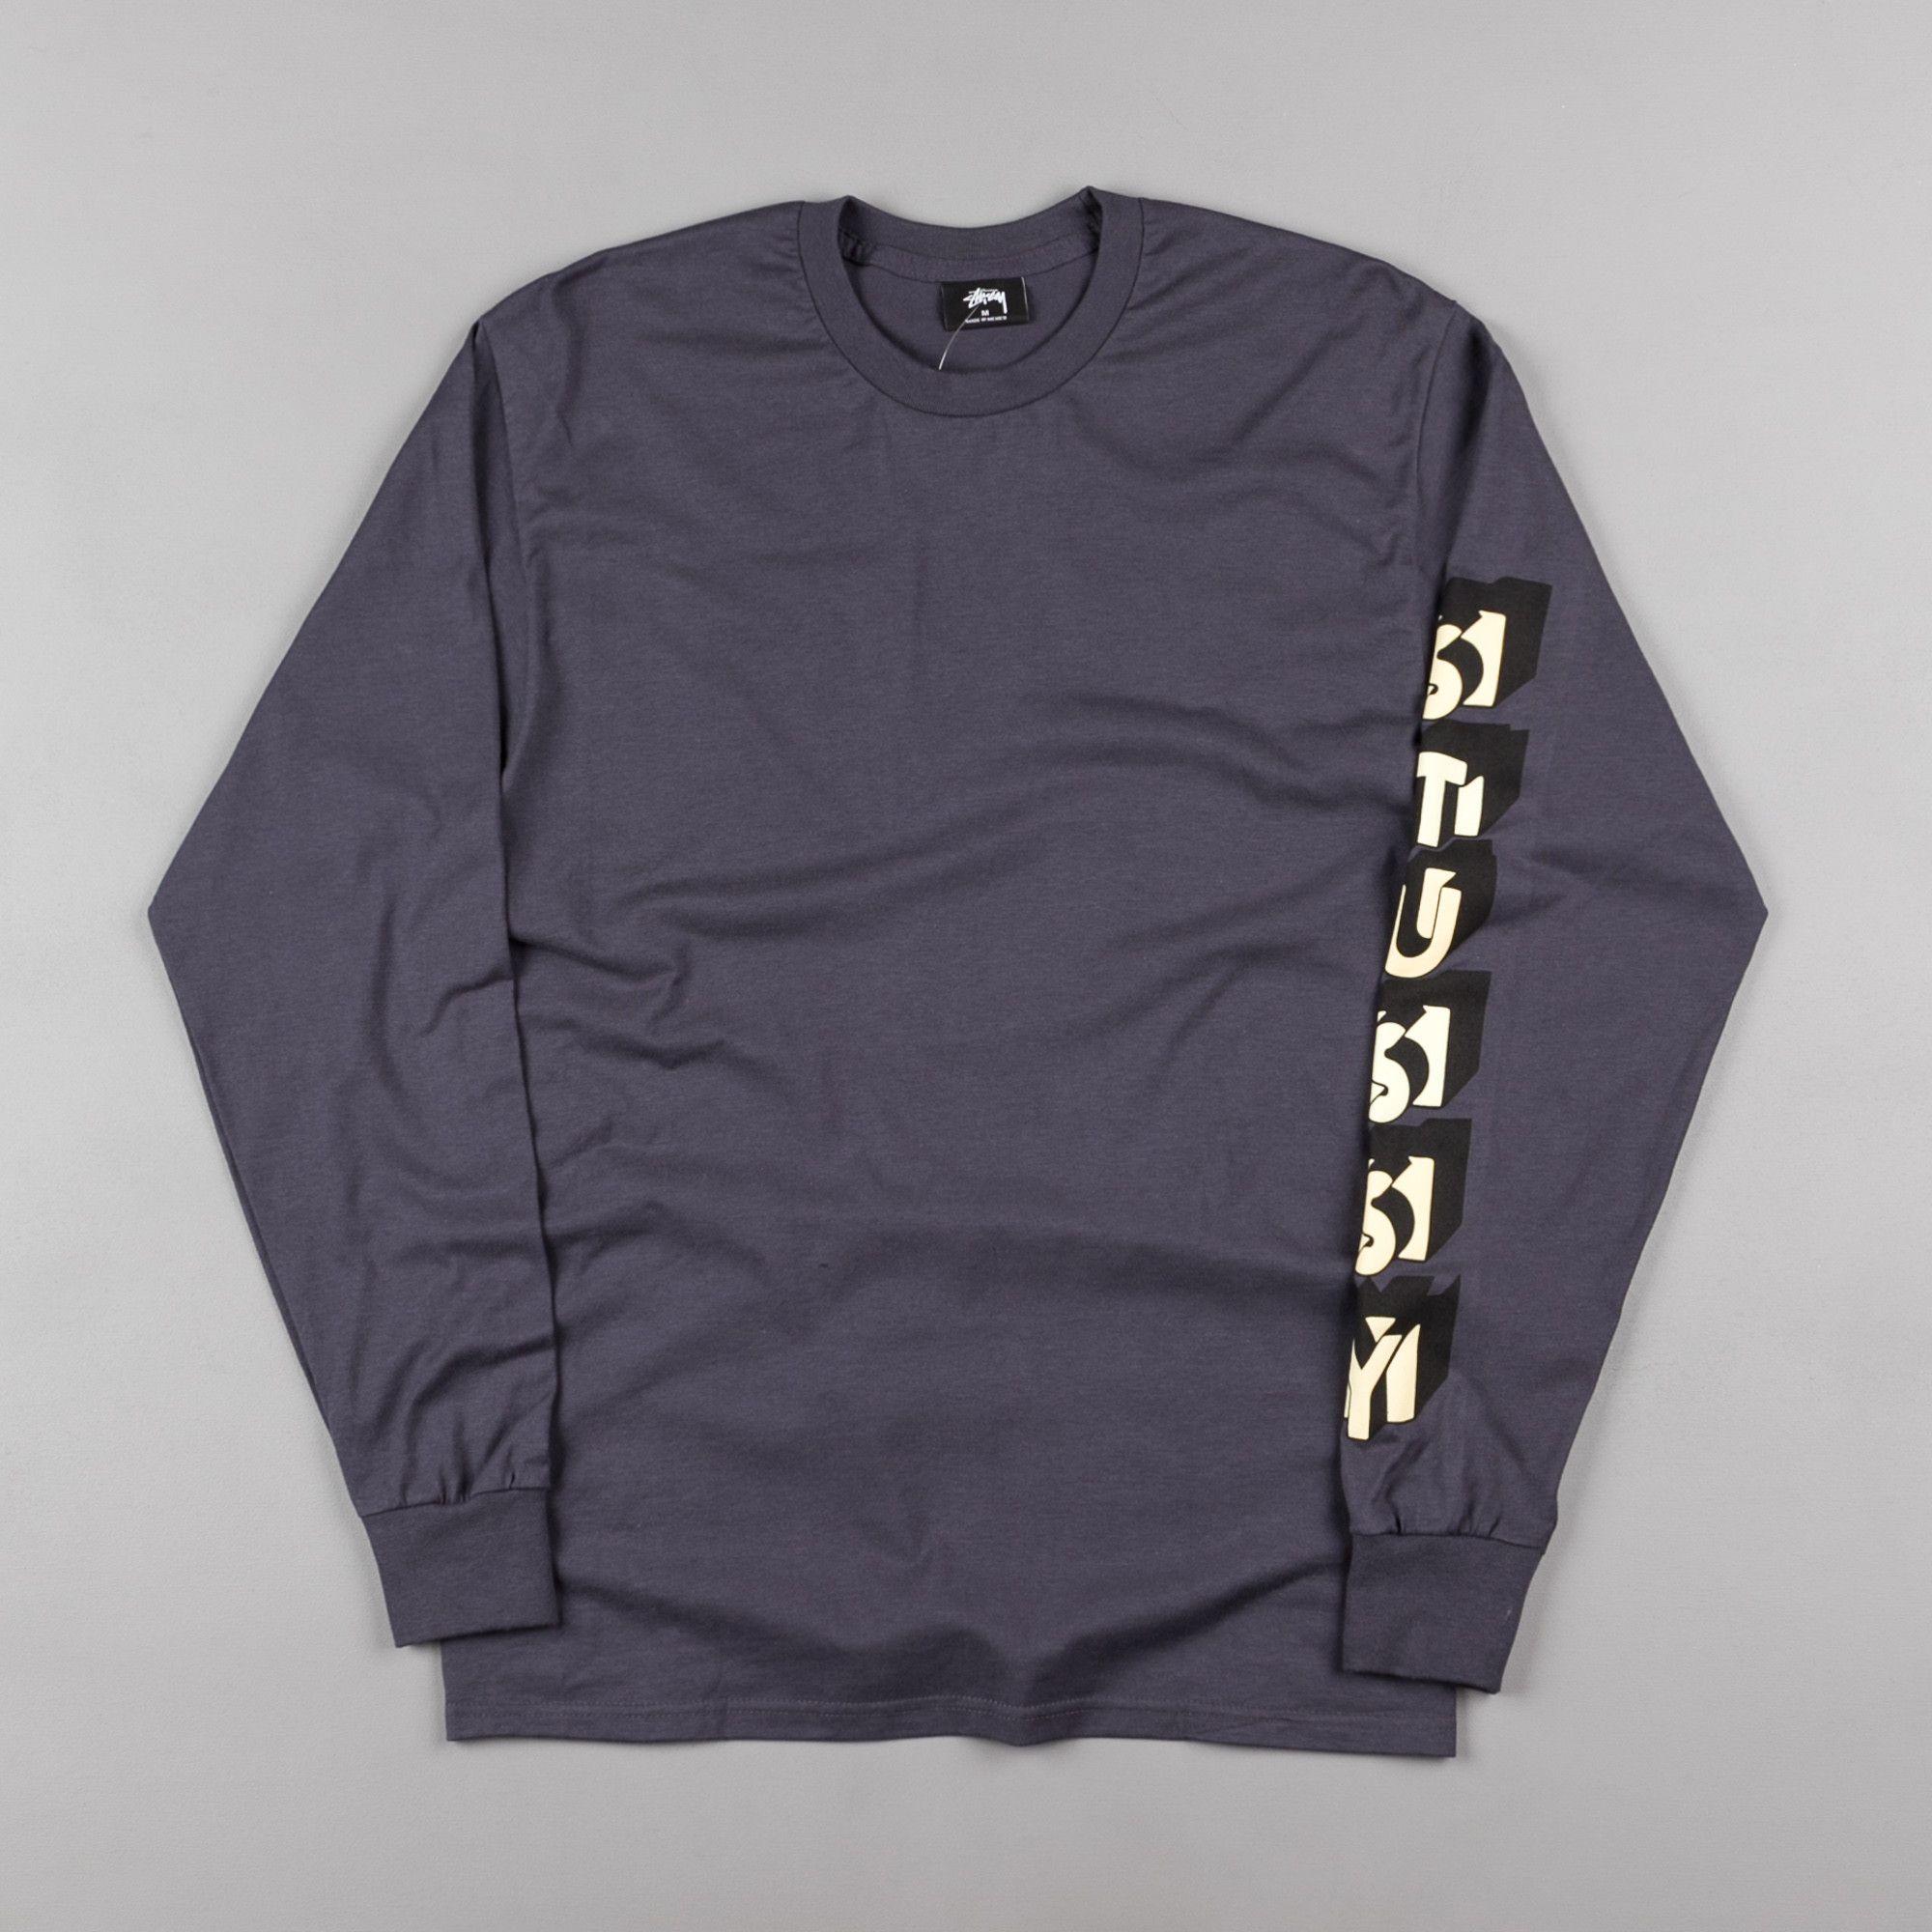 Stussy Blocks Long Sleeve T-Shirt - Midnight